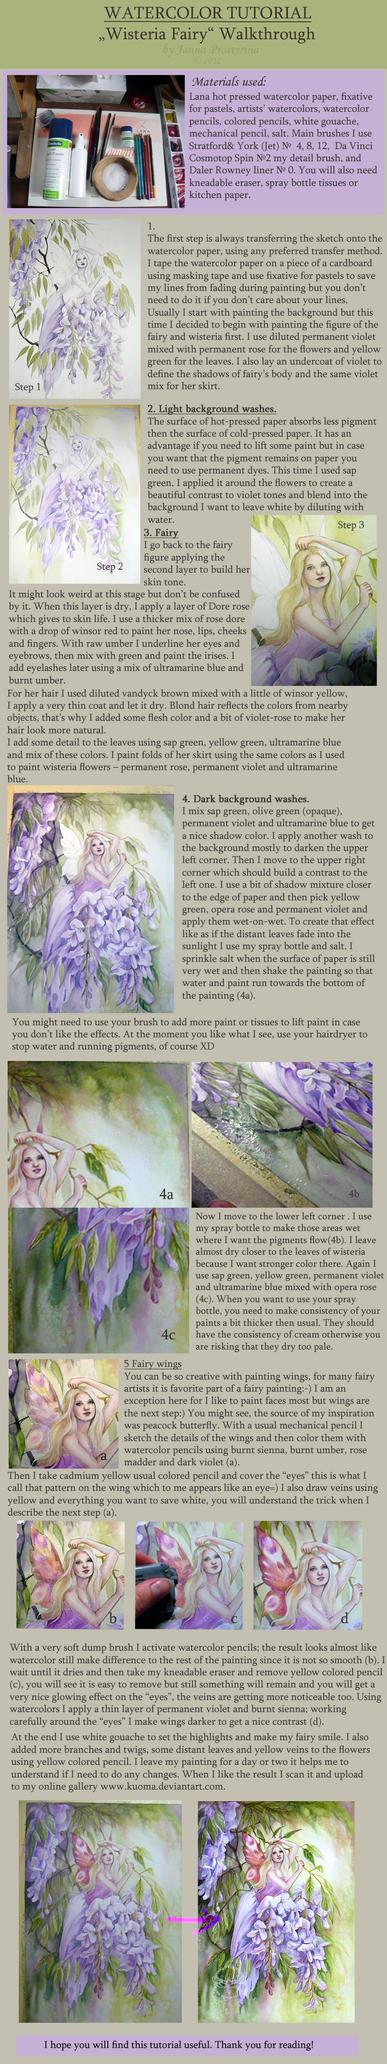 Watercolor Tutorial 2 by JannaFairyArt